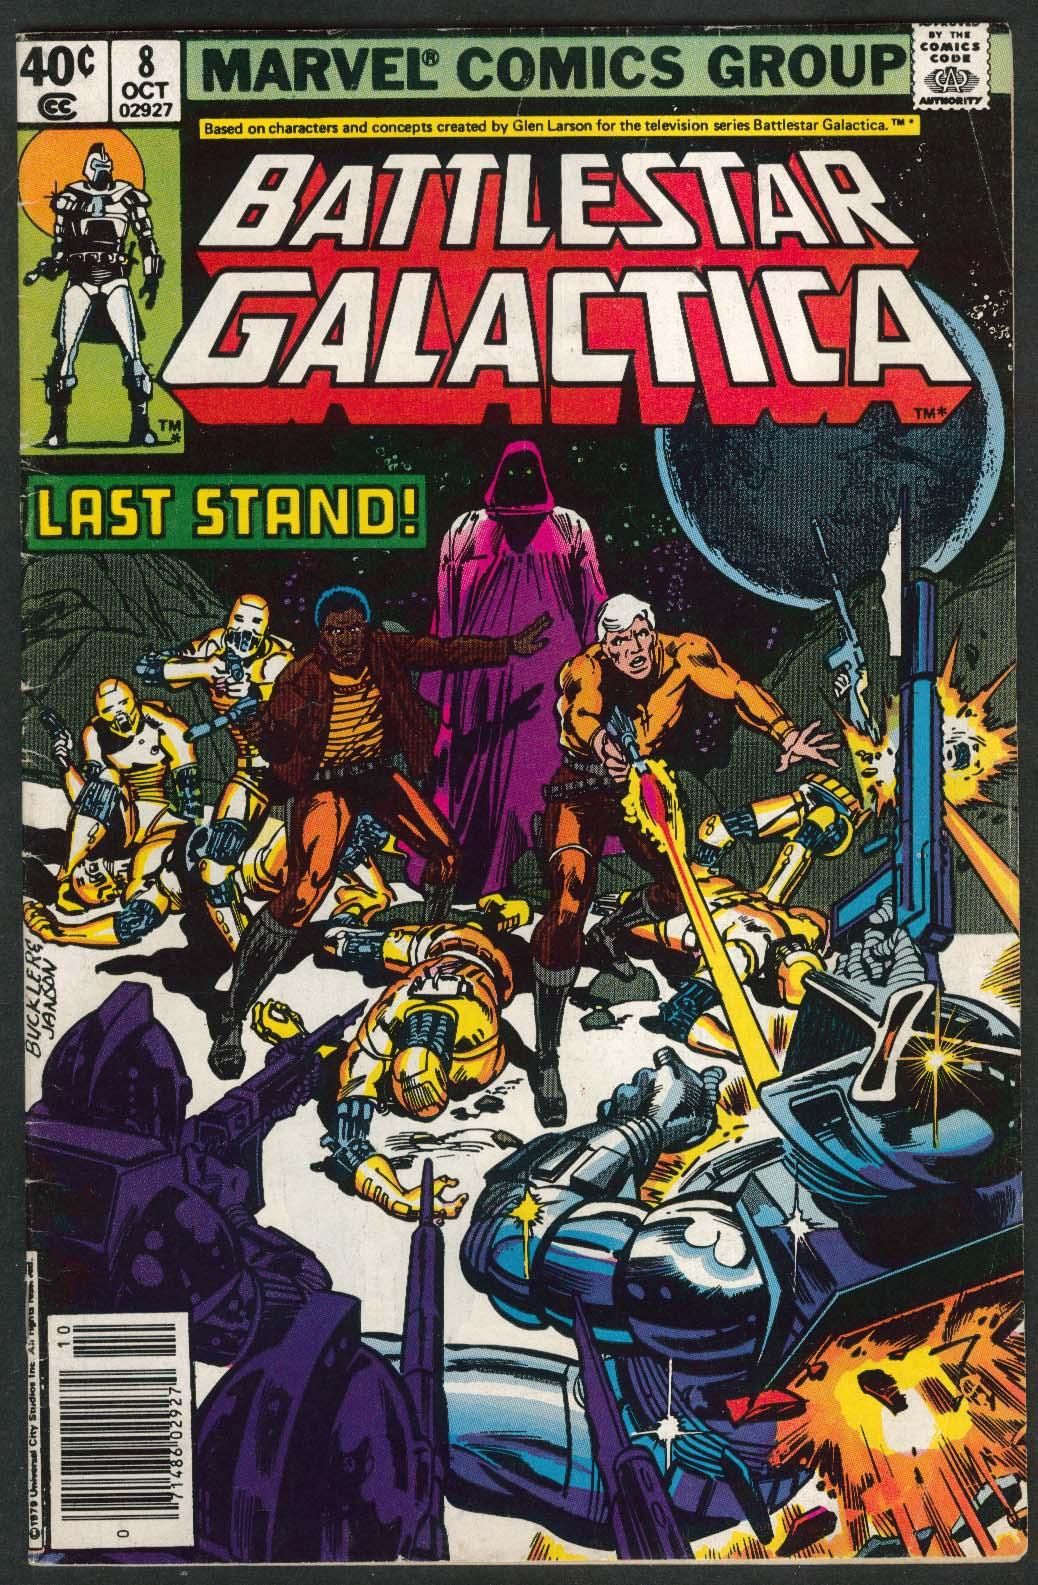 BATTLESTAR GALACTICA #8 Marvel comic book 10 1979